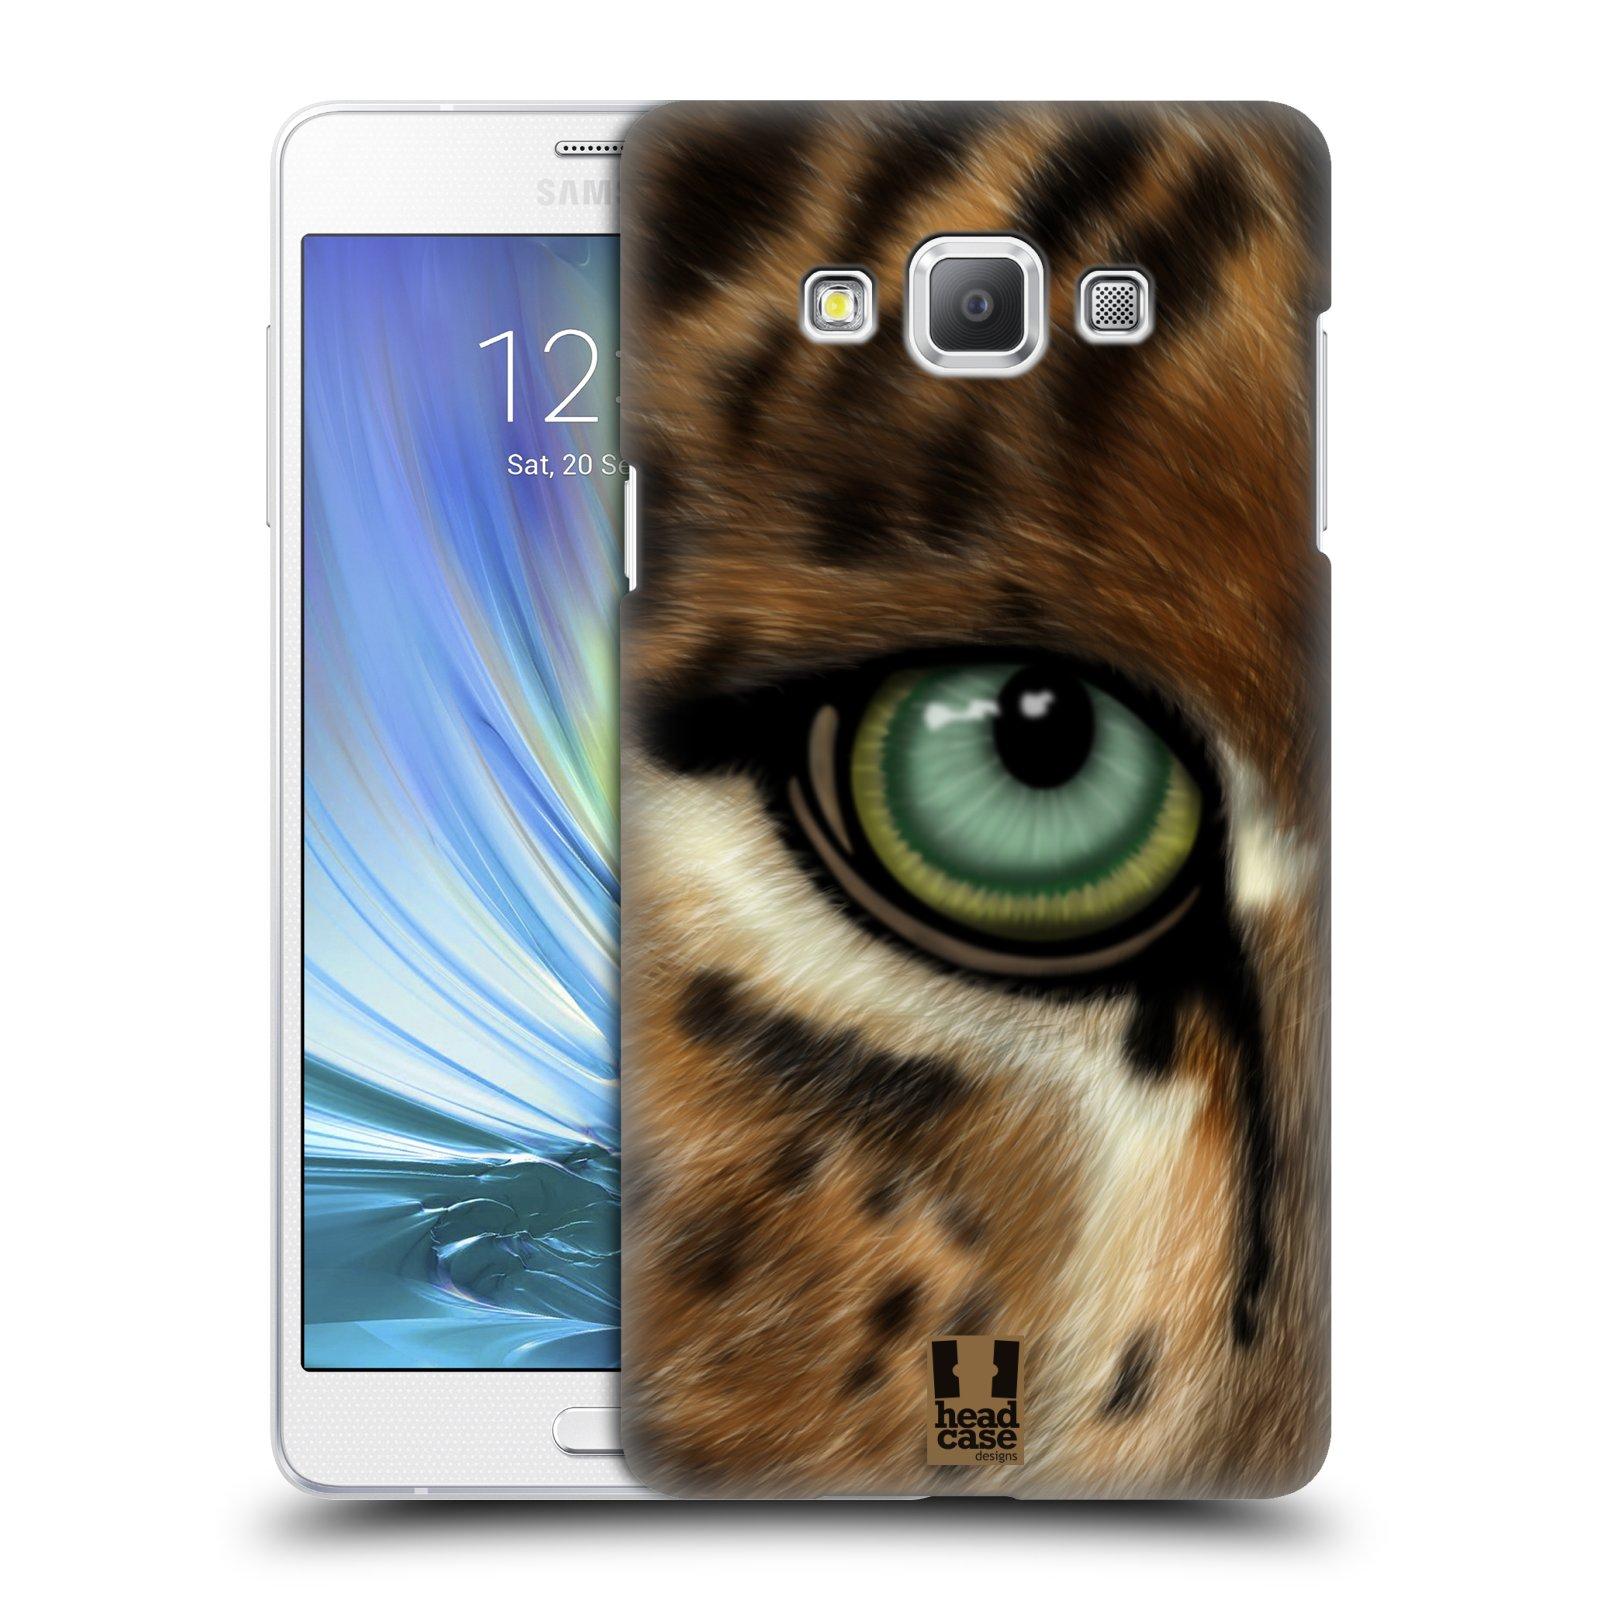 HEAD CASE plastový obal na mobil SAMSUNG GALAXY A7 vzor pohled zvířete oko leopard